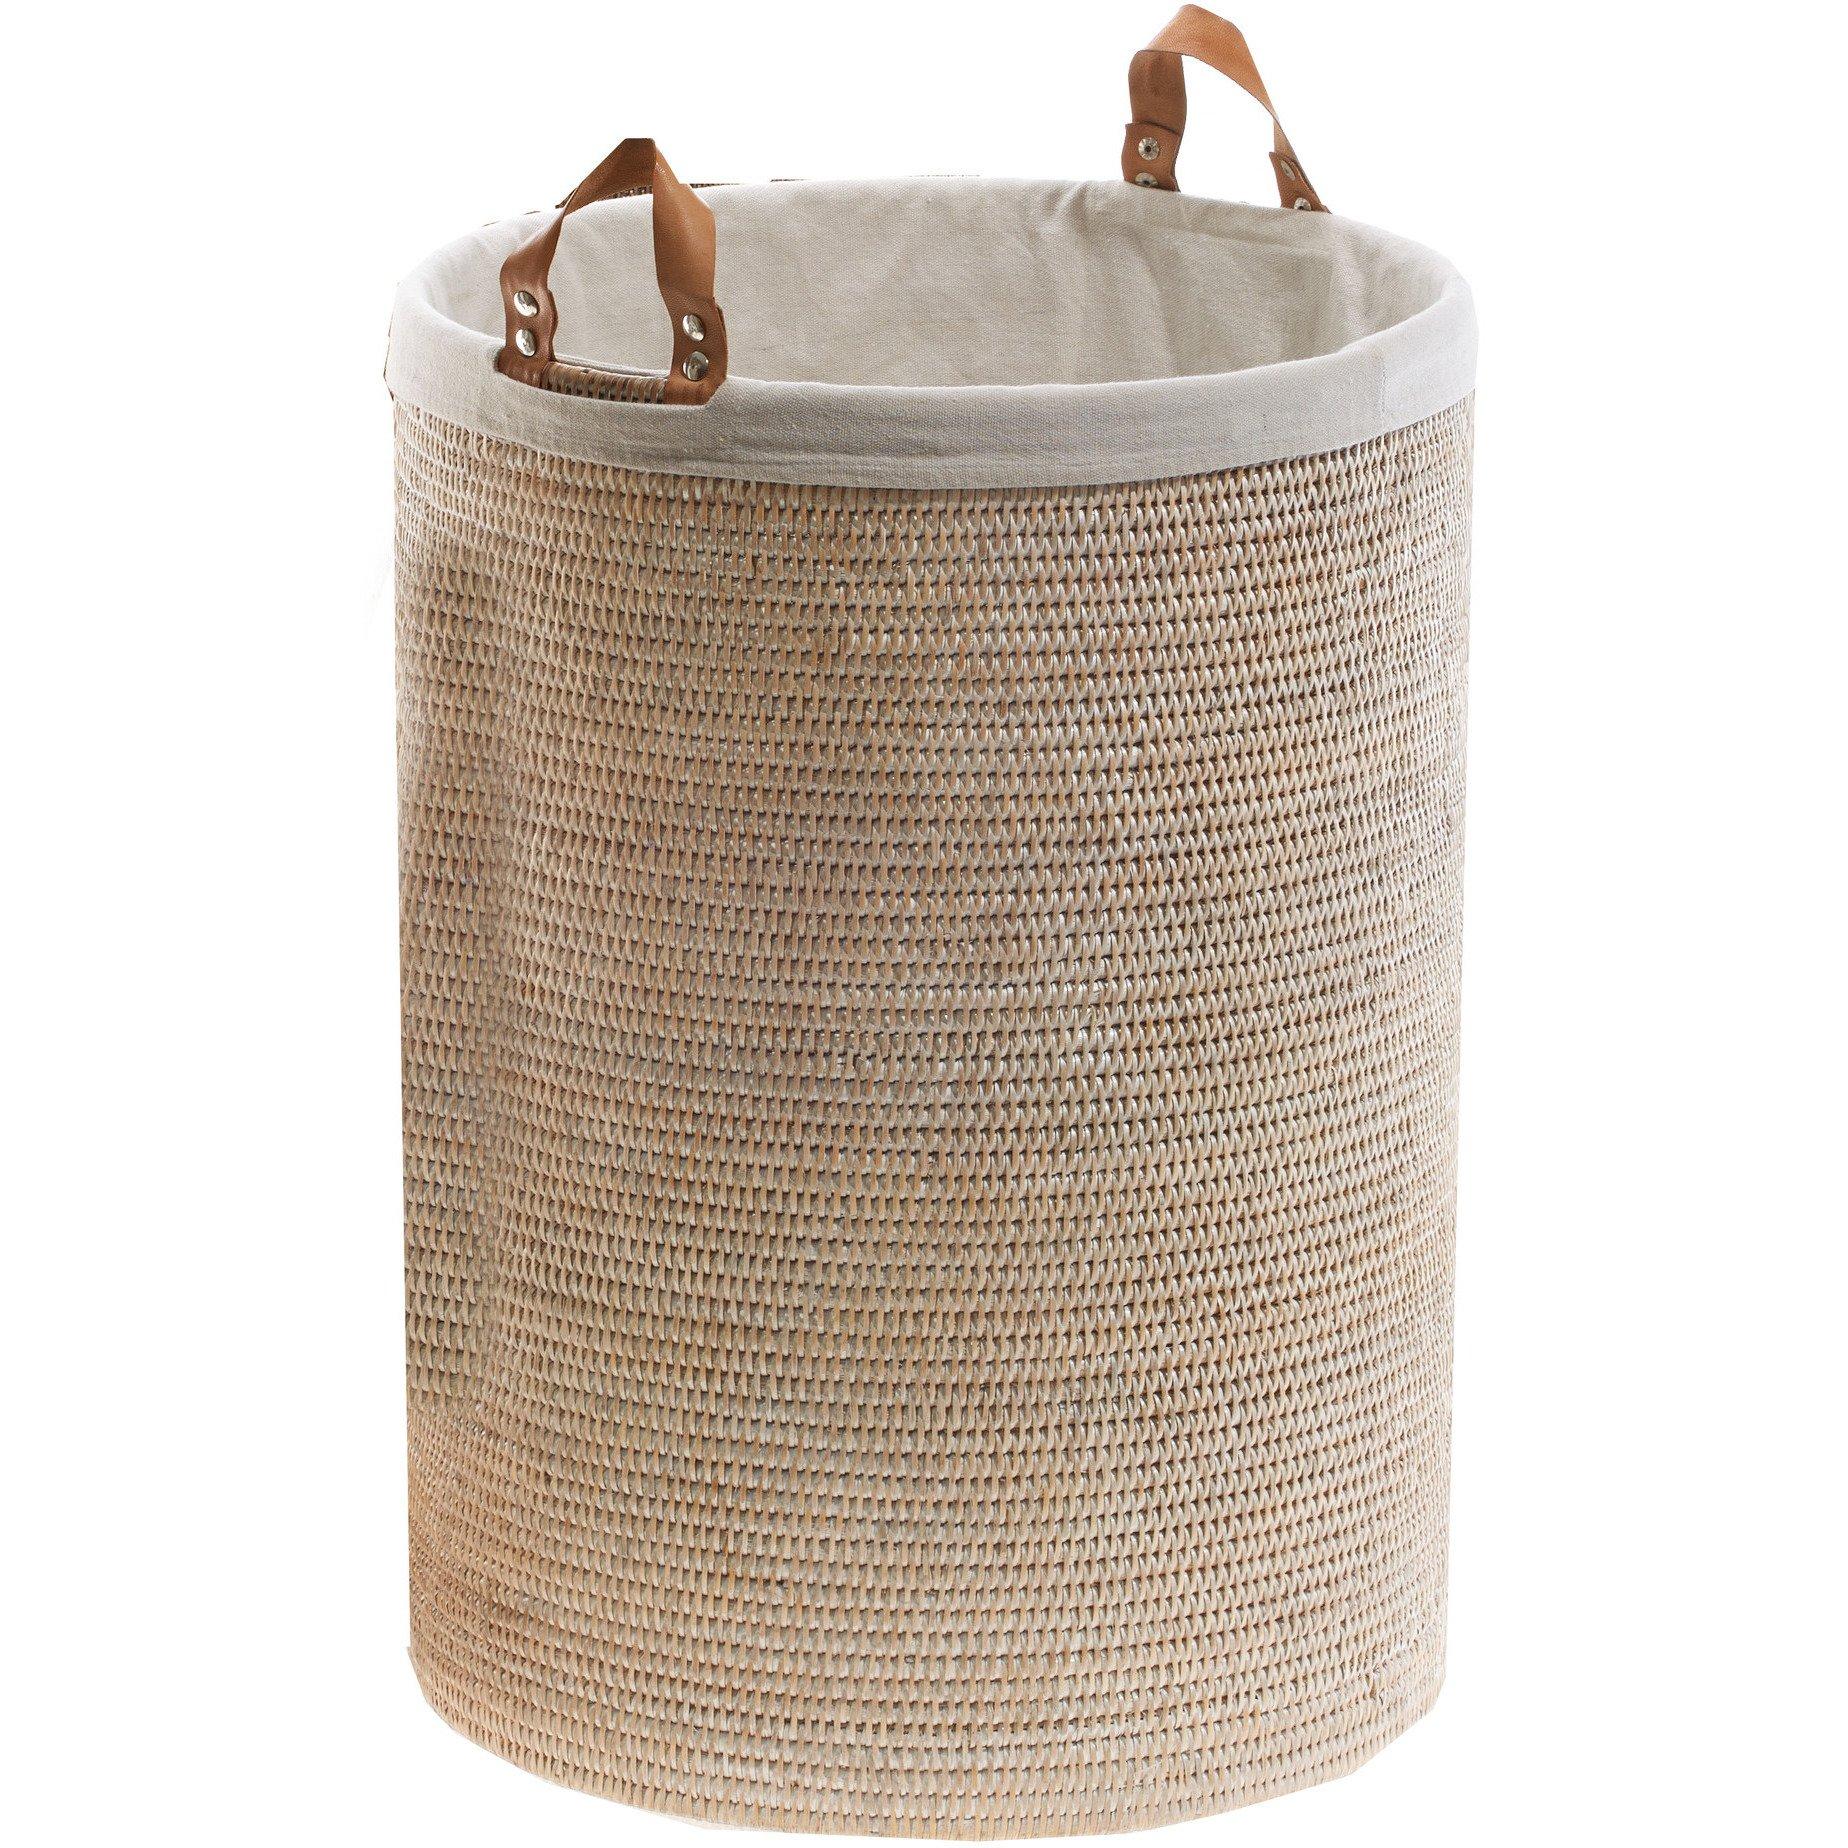 DWBA Malacca Single Round Spa Hamper Laundry Basket with Handles - Rattan (Light Rattan)